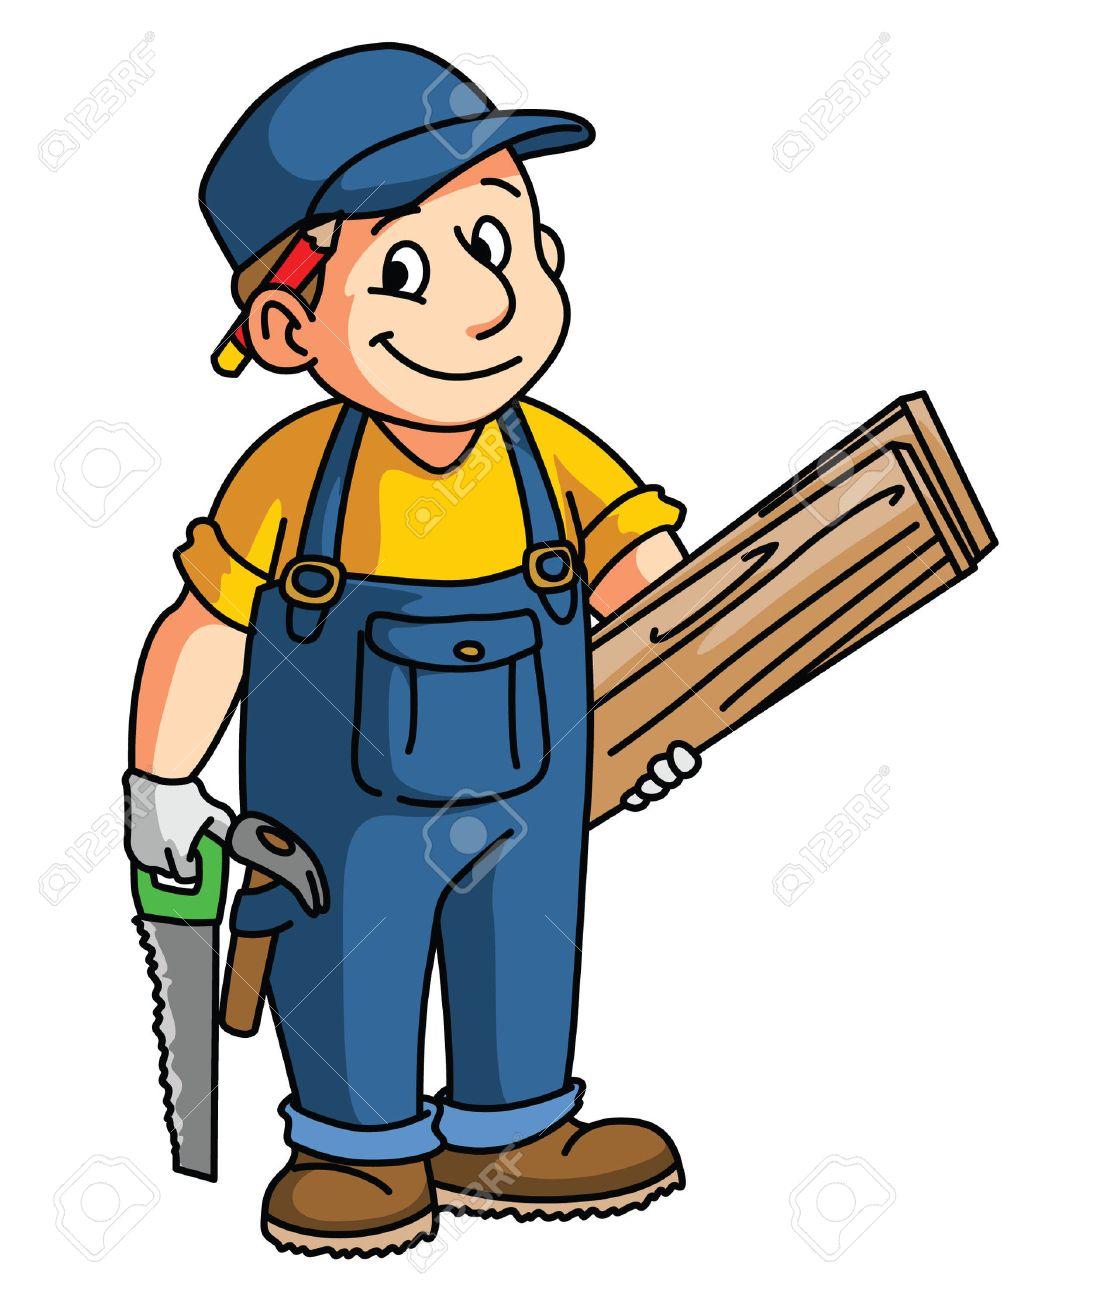 hight resolution of carpentry cliparts stock vector carpenter clipart community helper